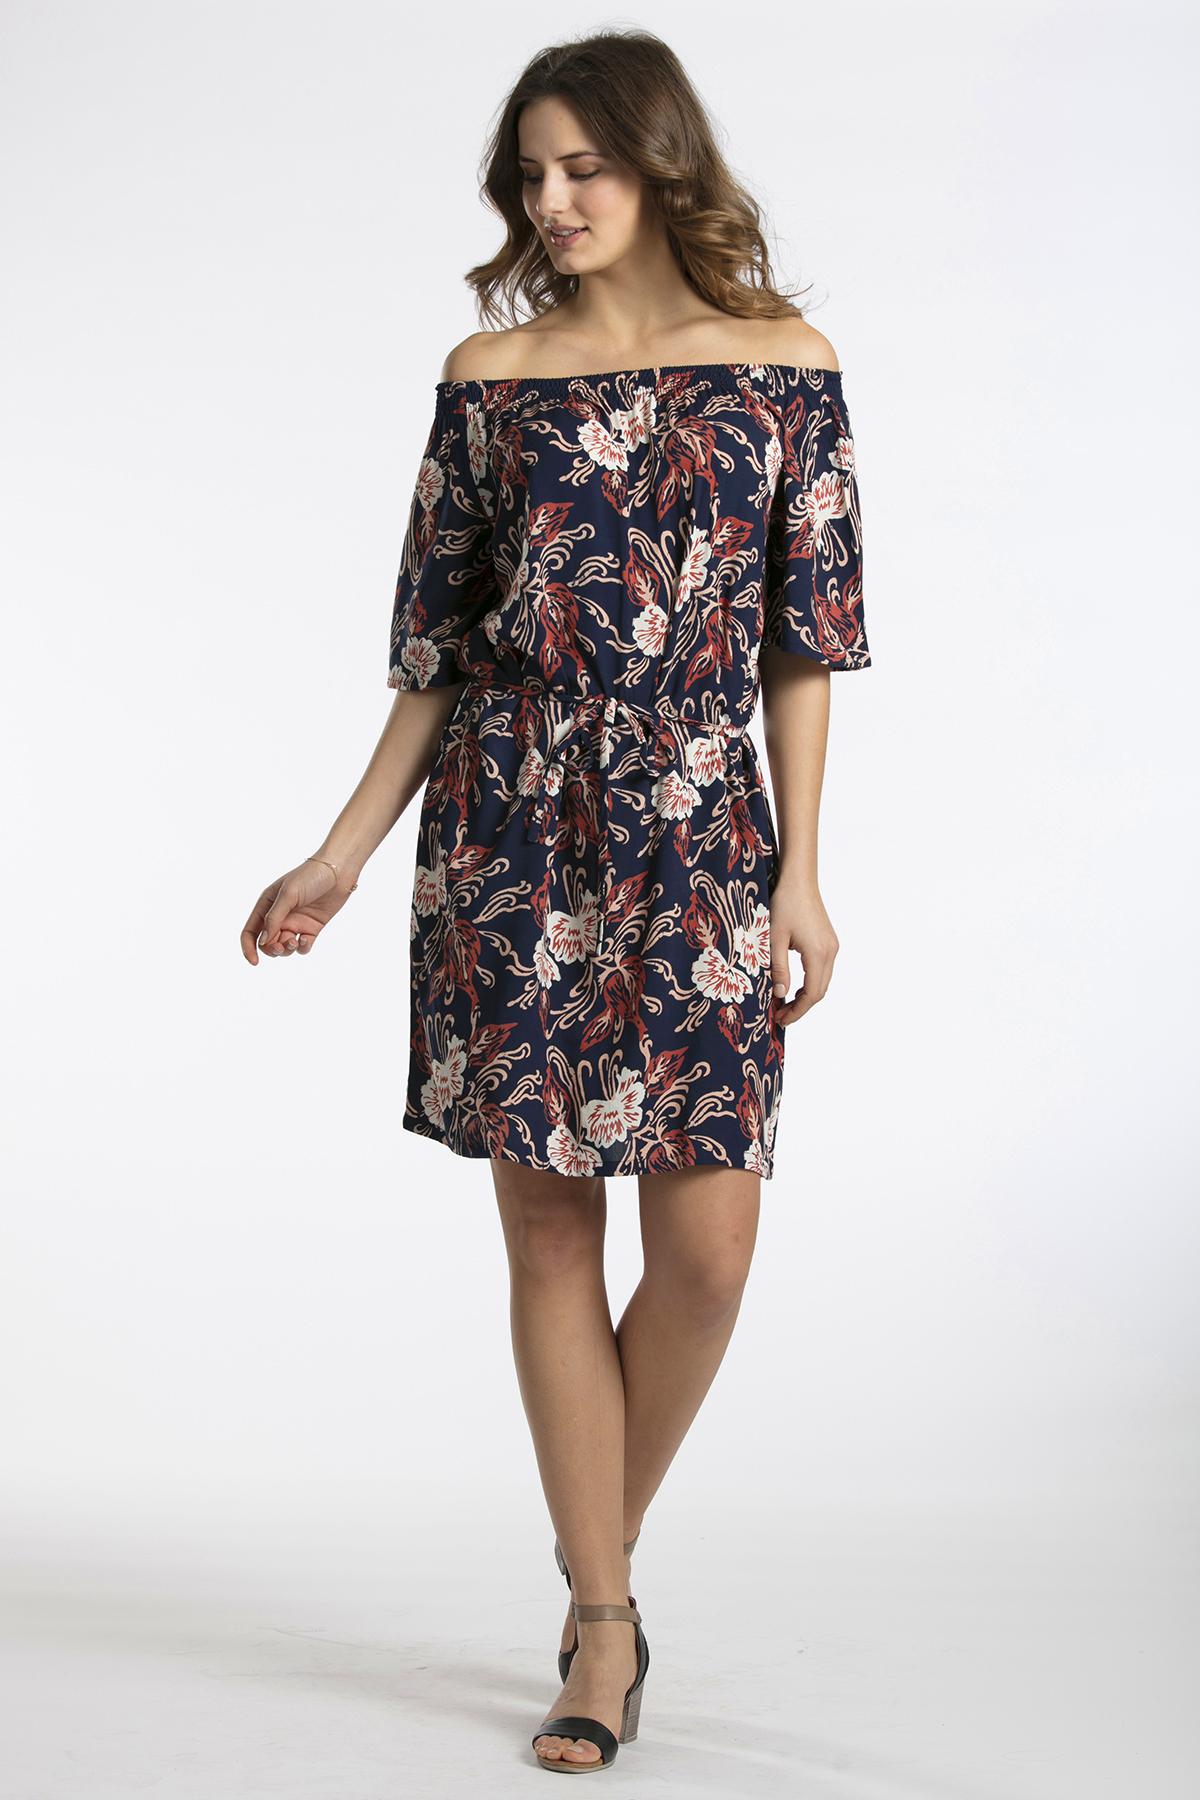 Marineblau/rot Kleid von Kaffe – Shoppen SieMarineblau/rot Kleid ab Gr. 34-46 hier